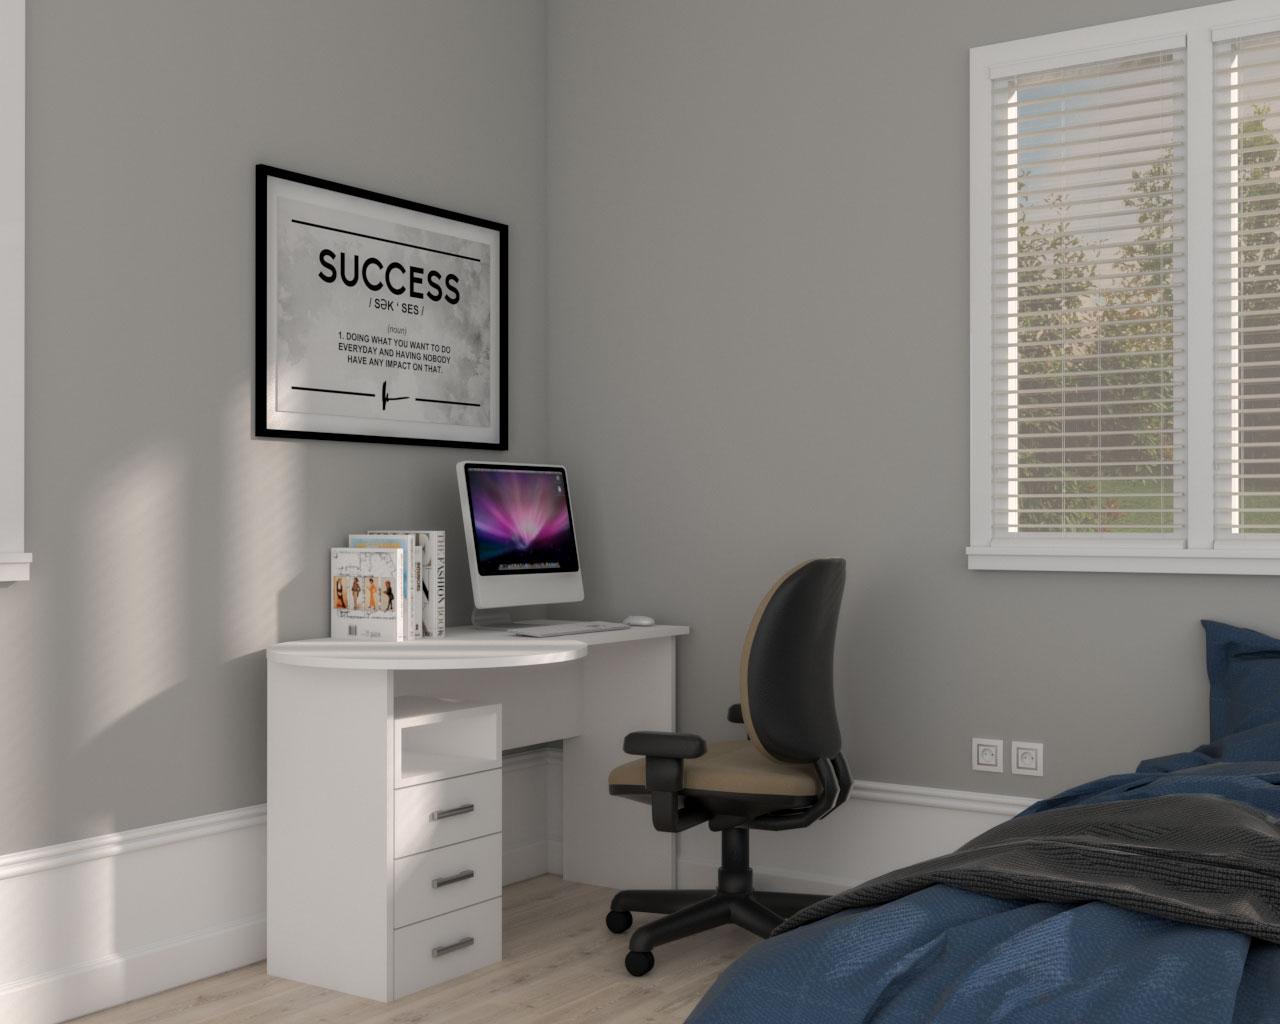 Bedroom holiday office corner